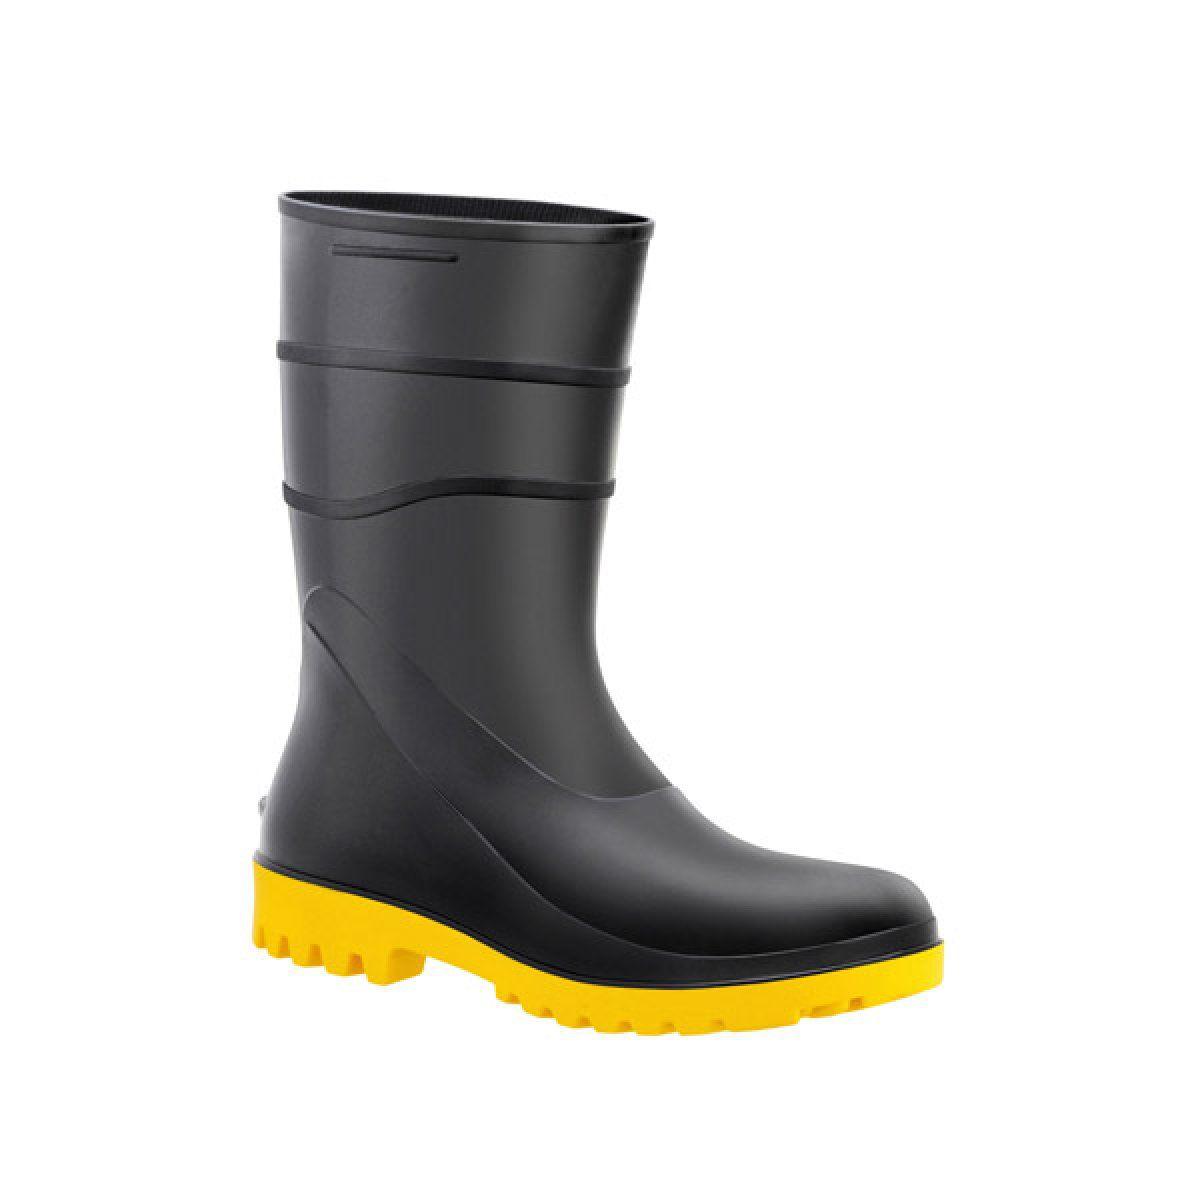 Bota de PVC Preta c/ Solado Amarelo N°38 - BRACOL